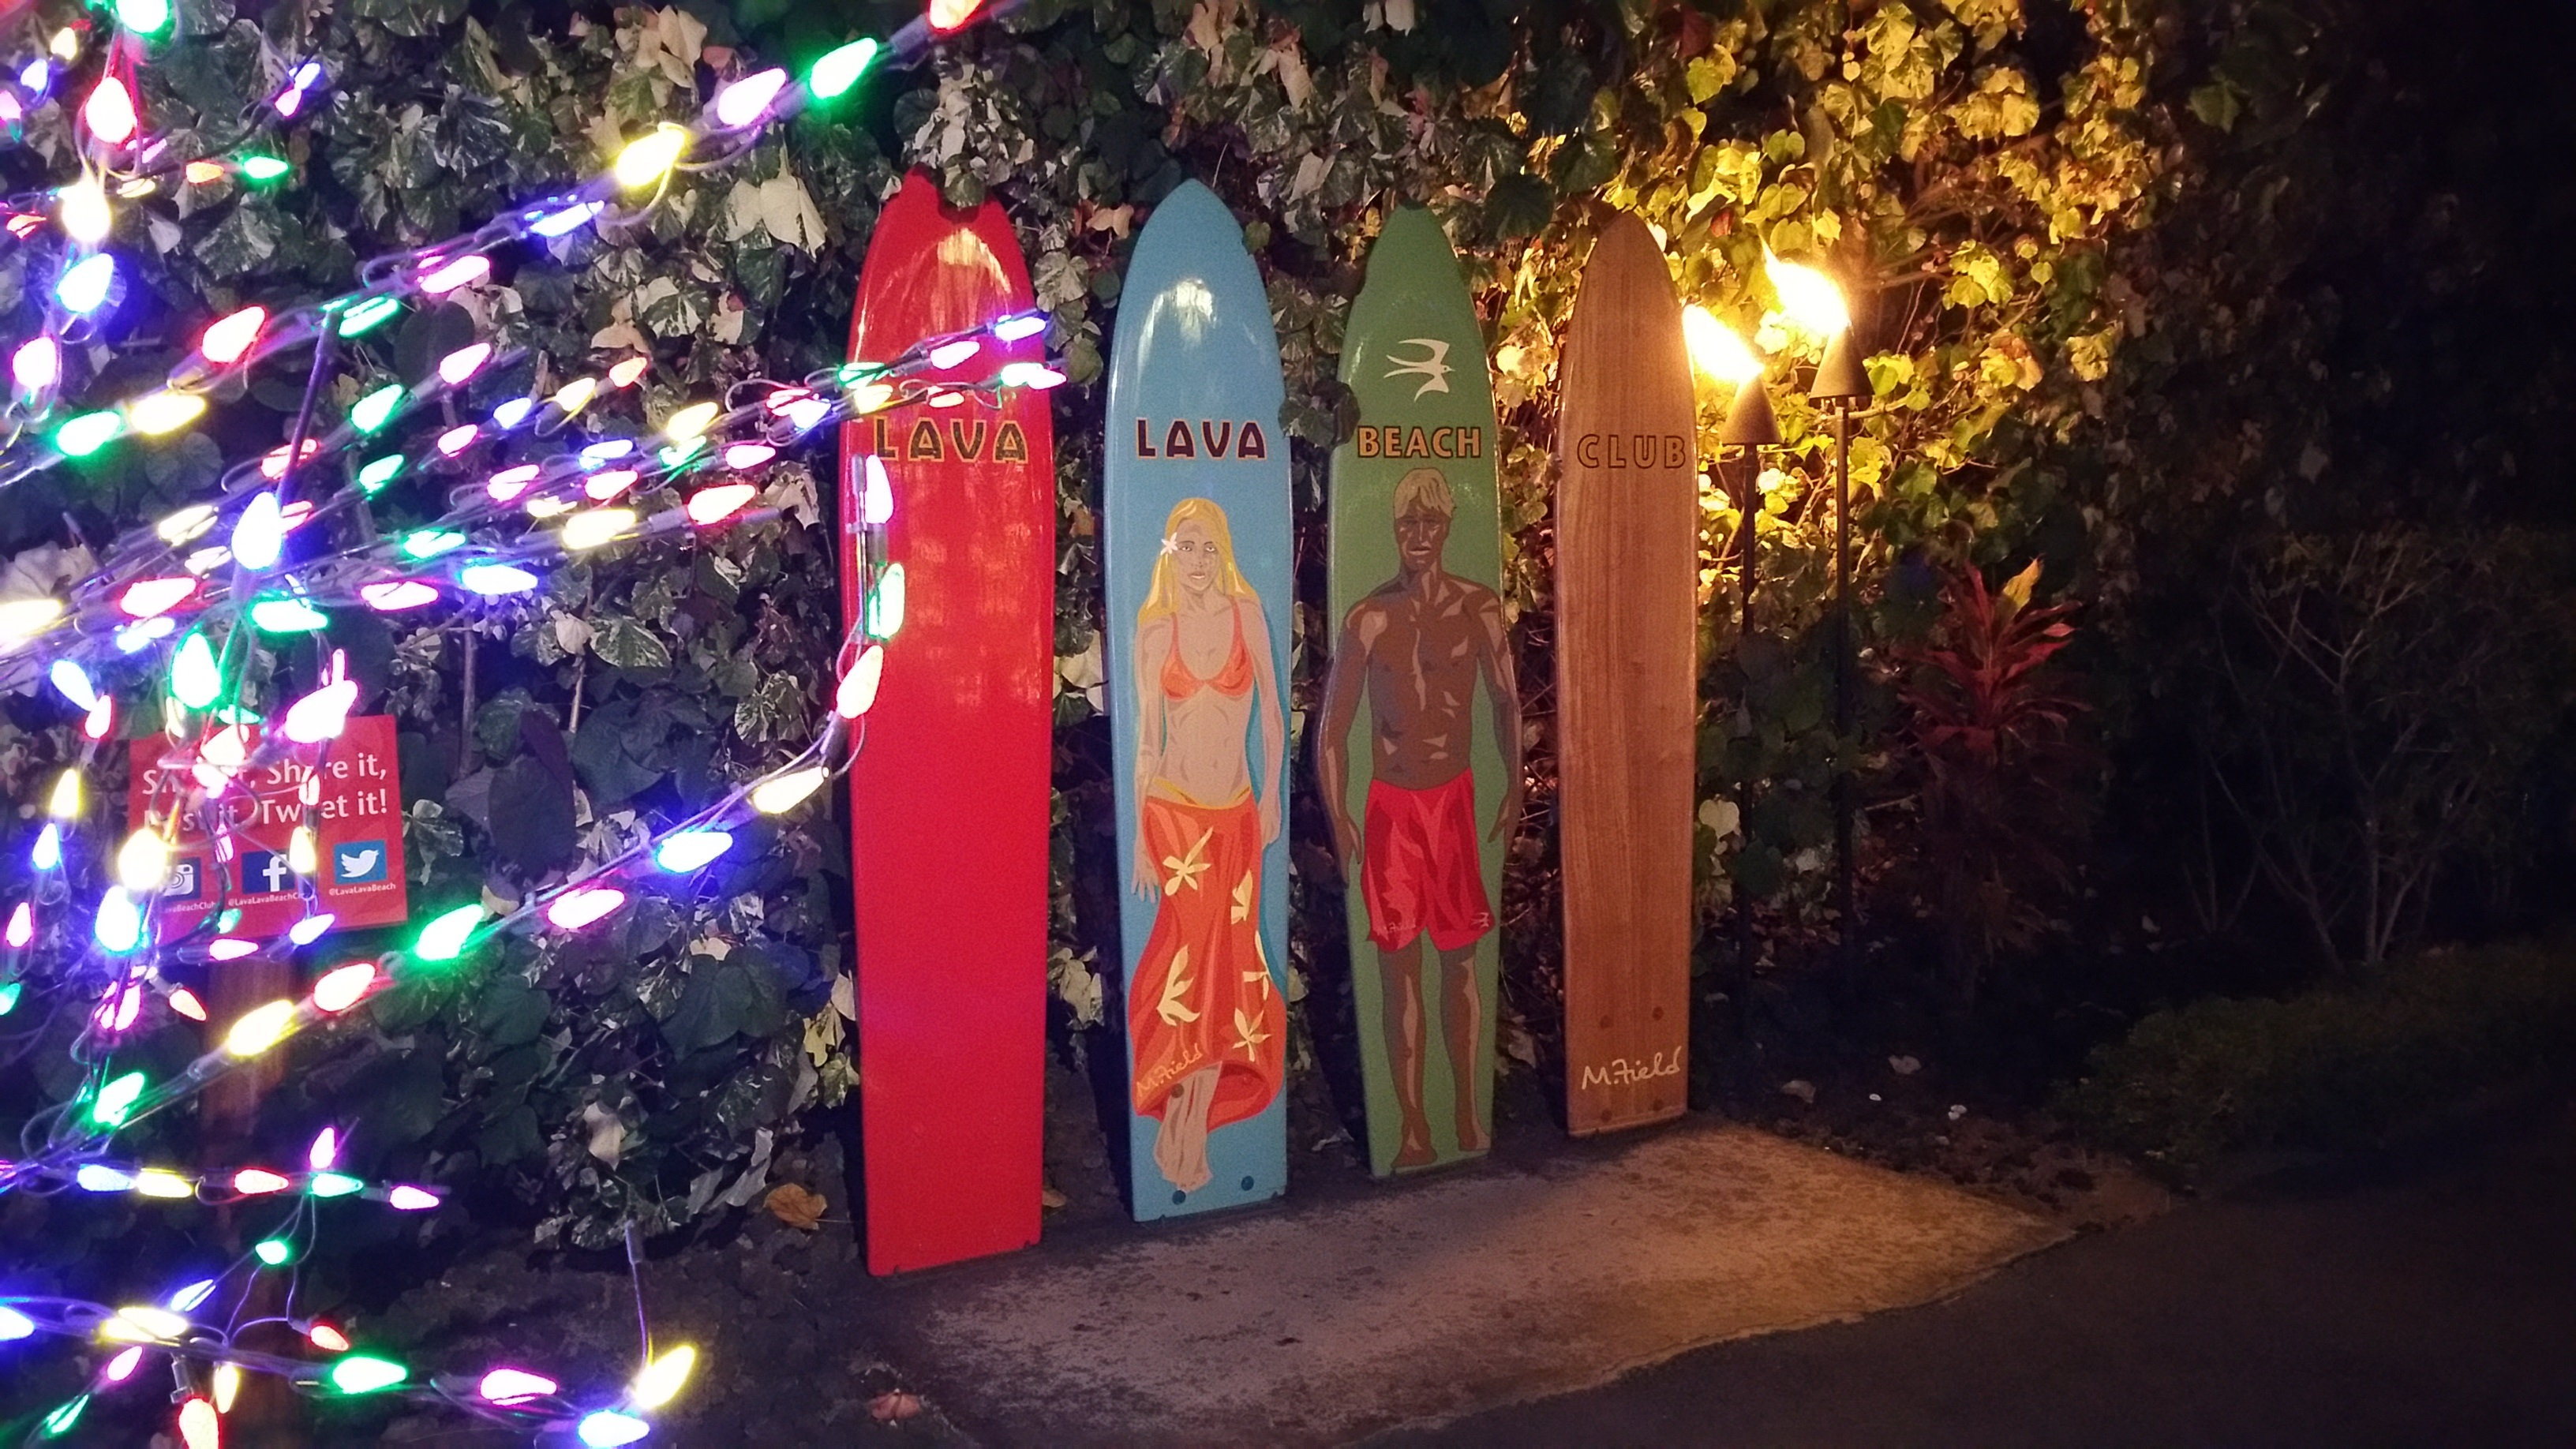 2020 Christmas Day Dinner Waikoloa Village Hilton Waikoloa Village and Grand Vacations Resort   My Family Travels